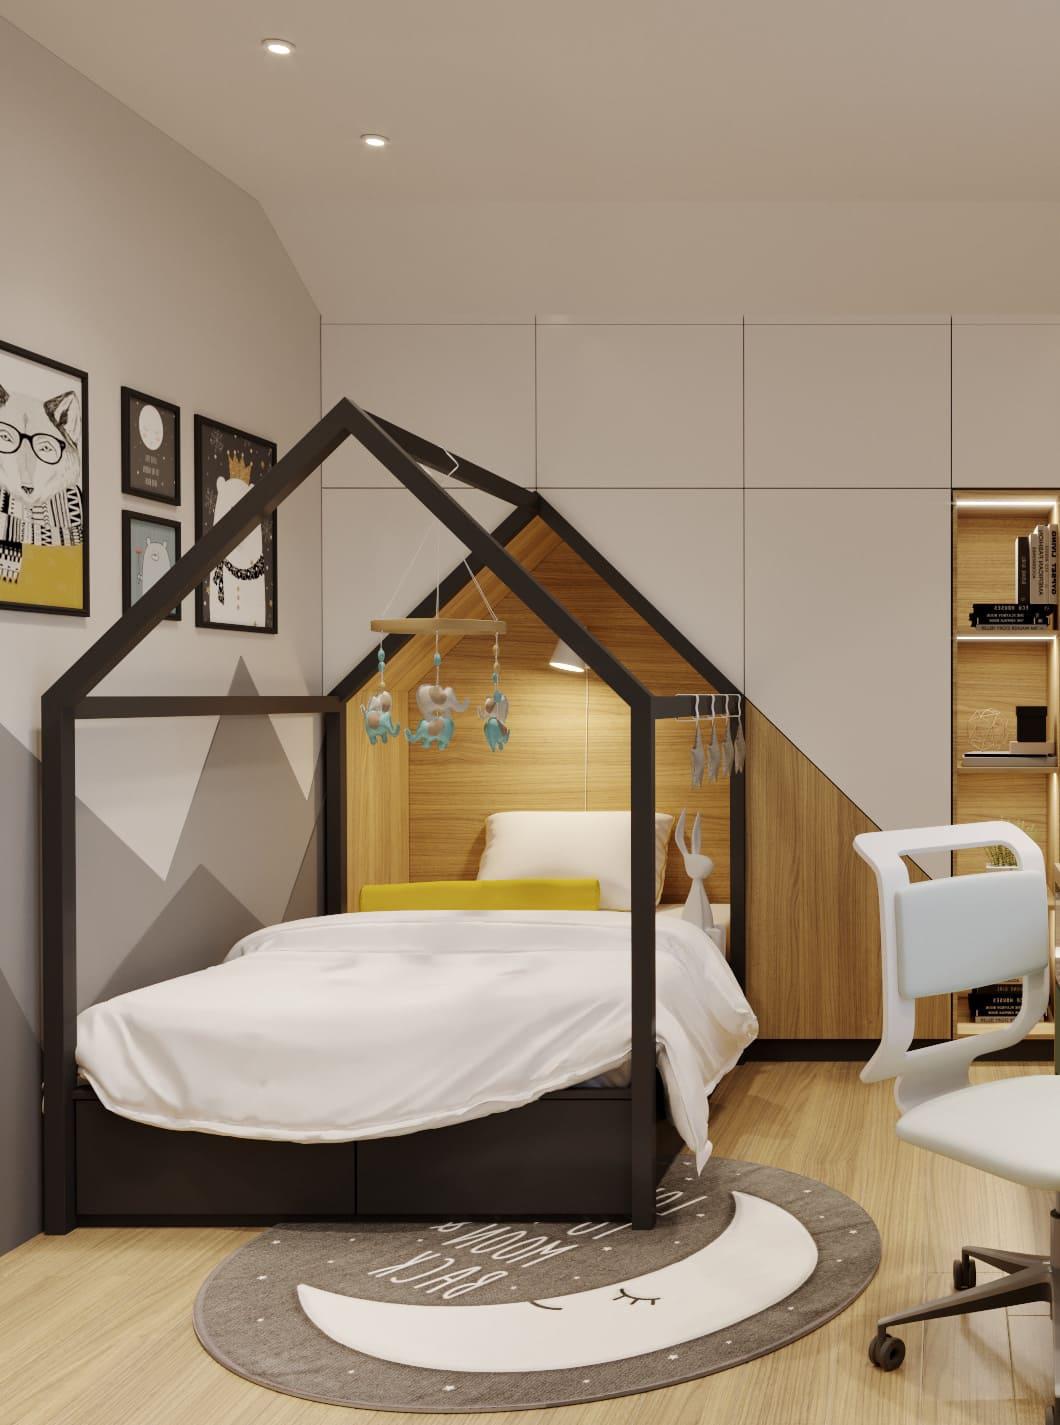 интерьер детской комнаты фото 71